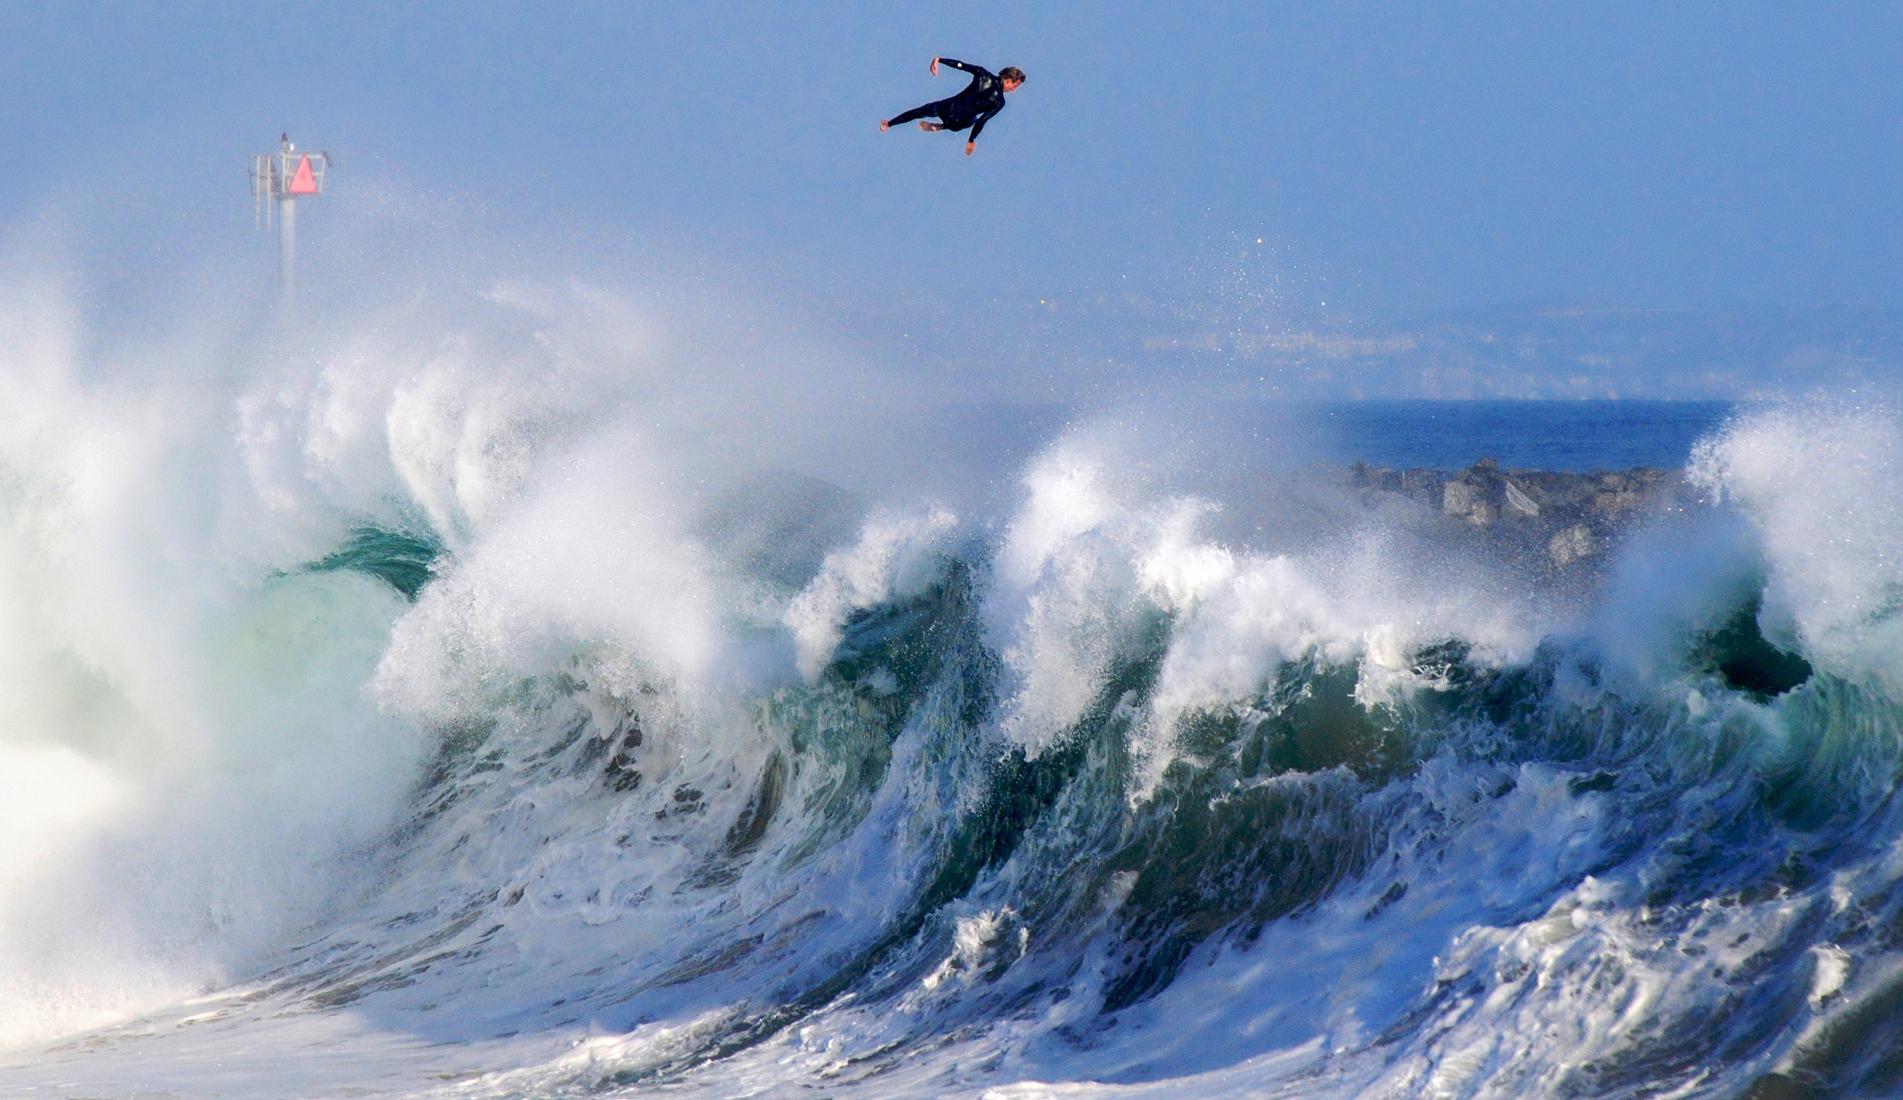 fotos-adrenalina-watersports-1